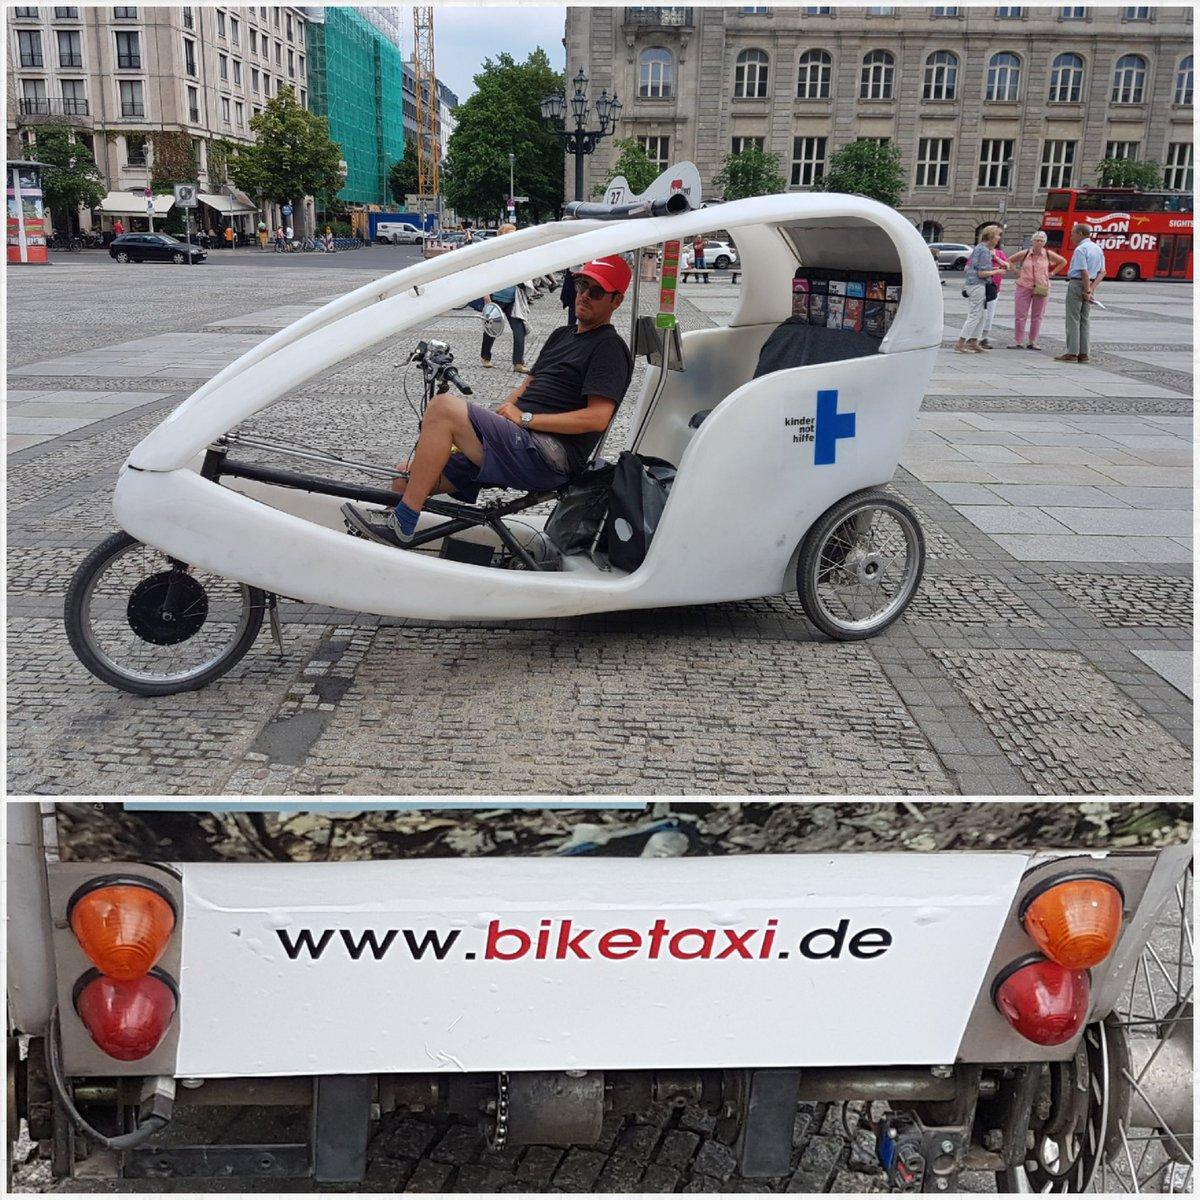 Kn Vaidyanathan On Twitter Biketaxi Berlin 3 Wheeler Pedal Taxi In Cute Design